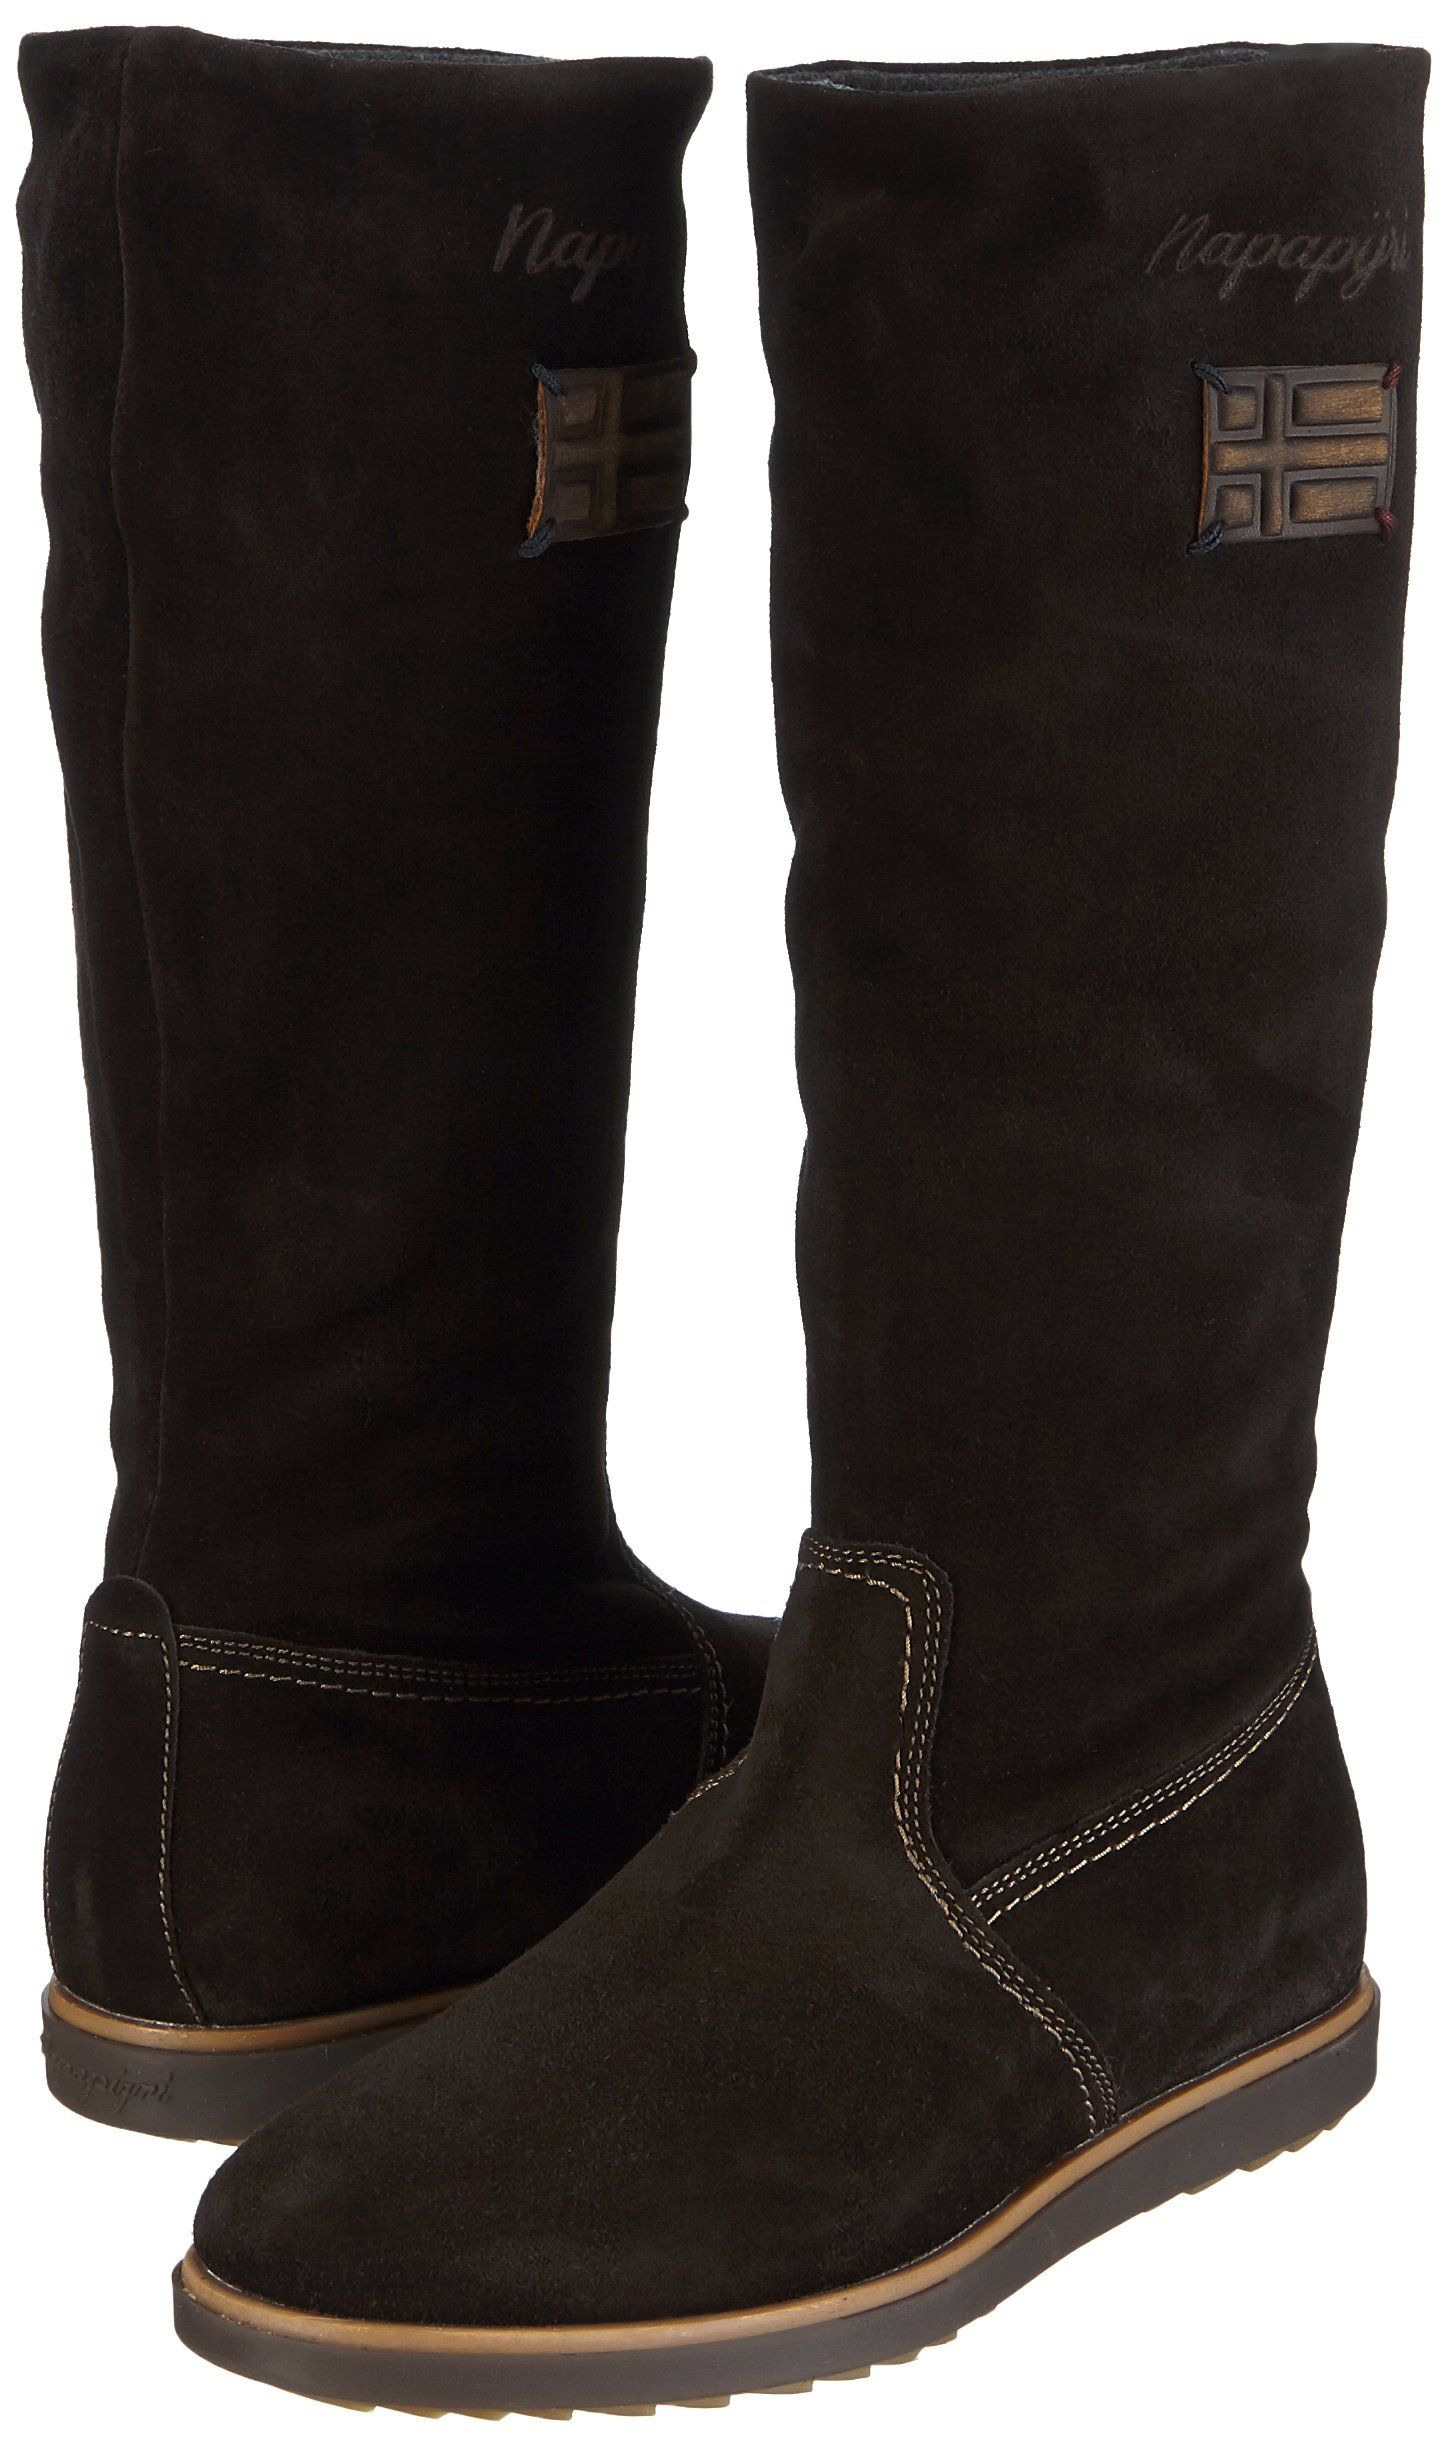 super popular 12c4e 82b70 NAPAPIJRI FOOTWEAR Nora Damen Langschaft Stiefel: Amazon.de ...